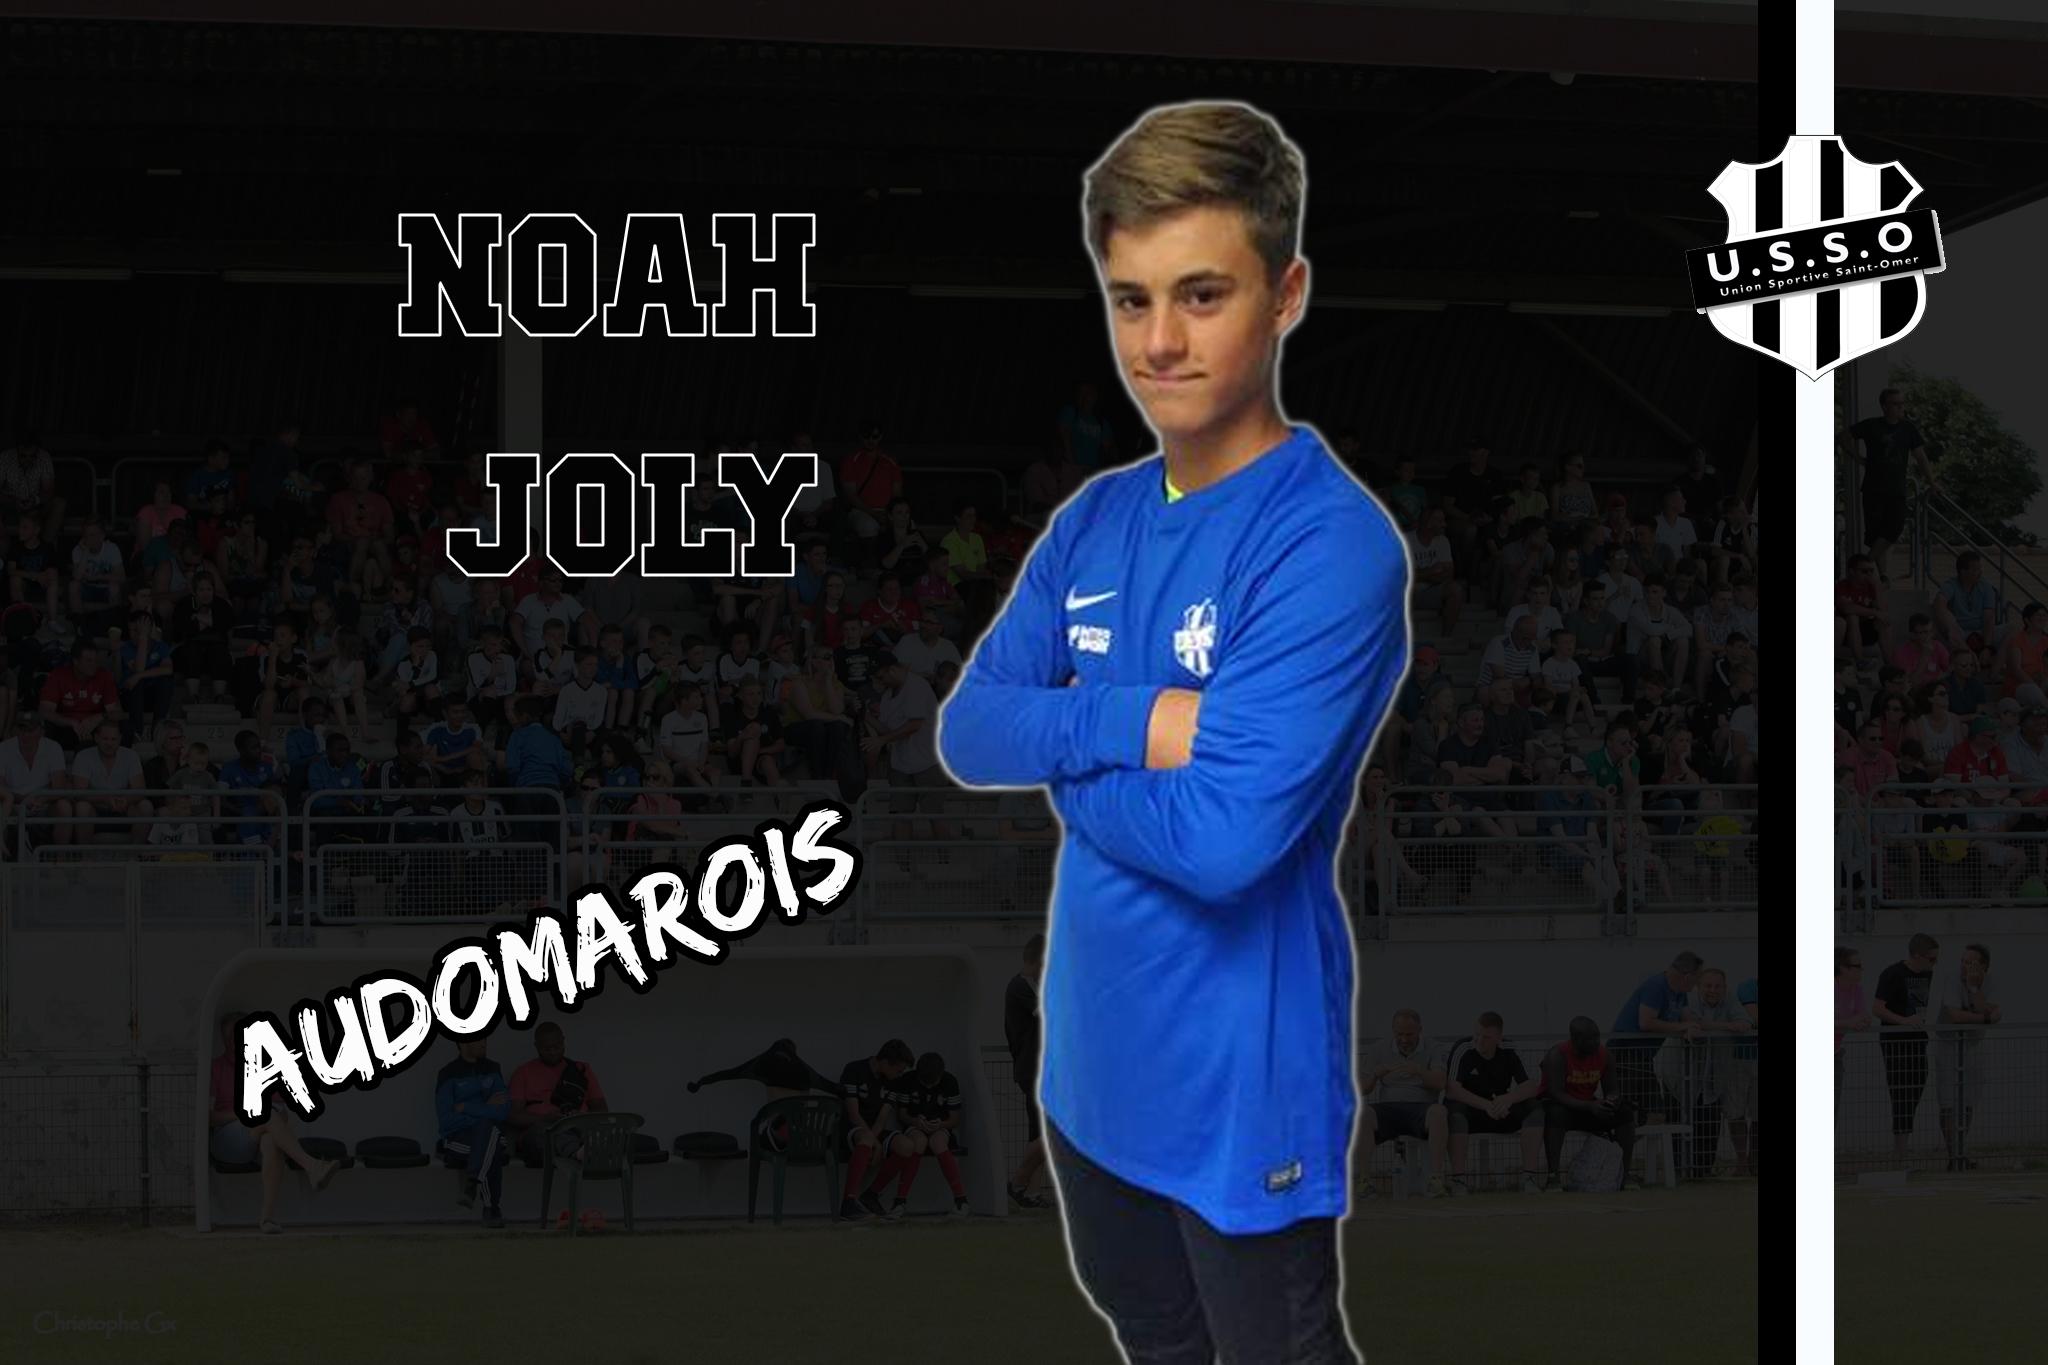 NOAH JOLY.jpg